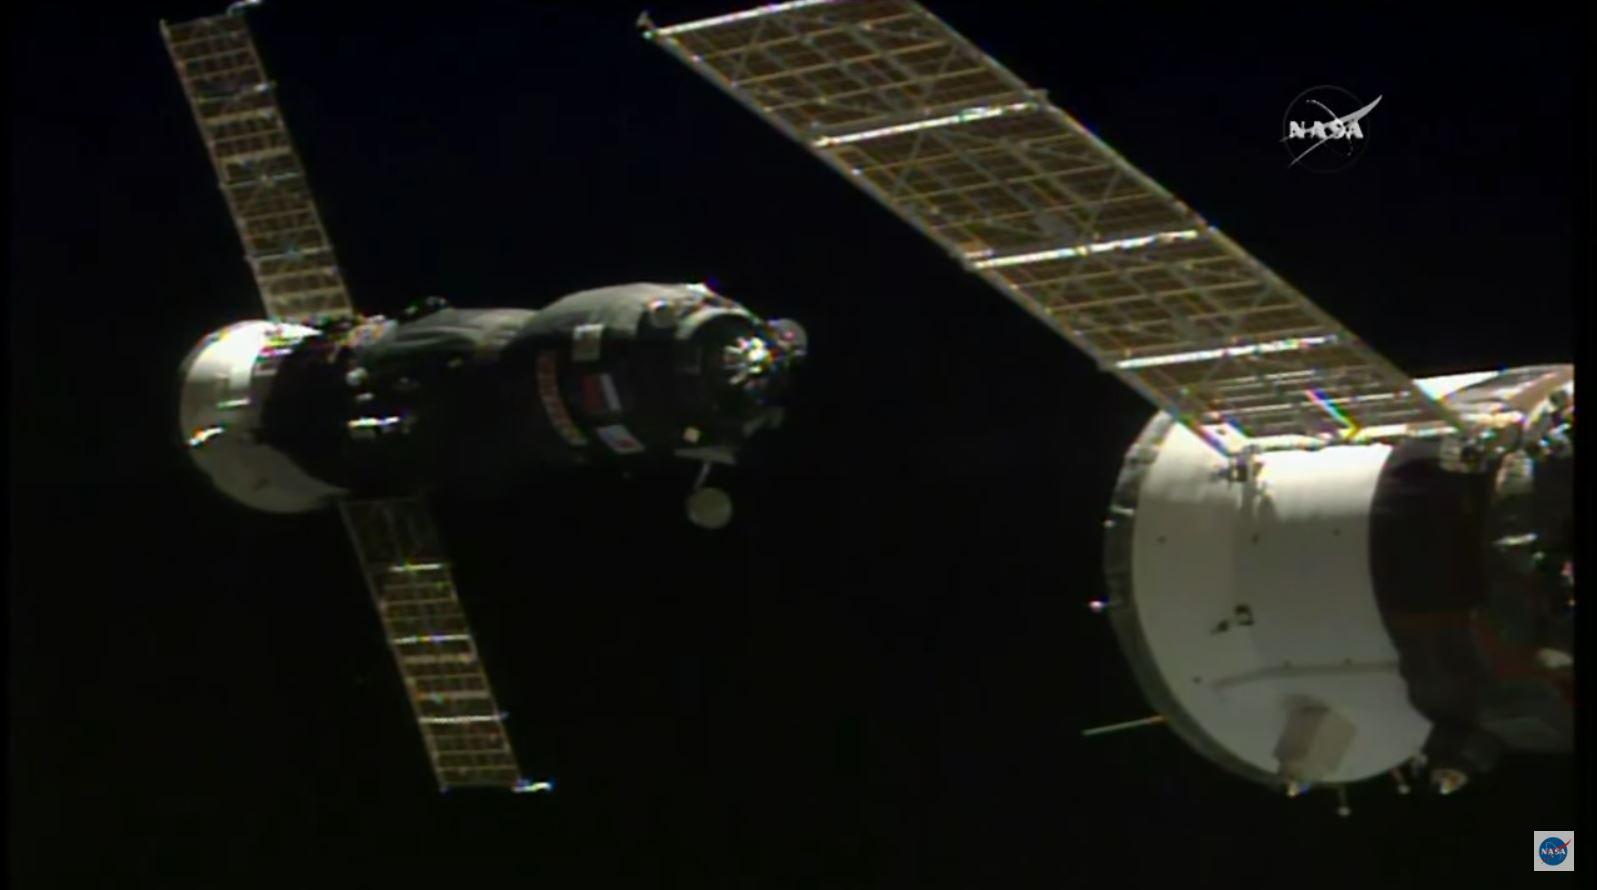 Russian Progress 66 Cargo Ship Docks at Space Station